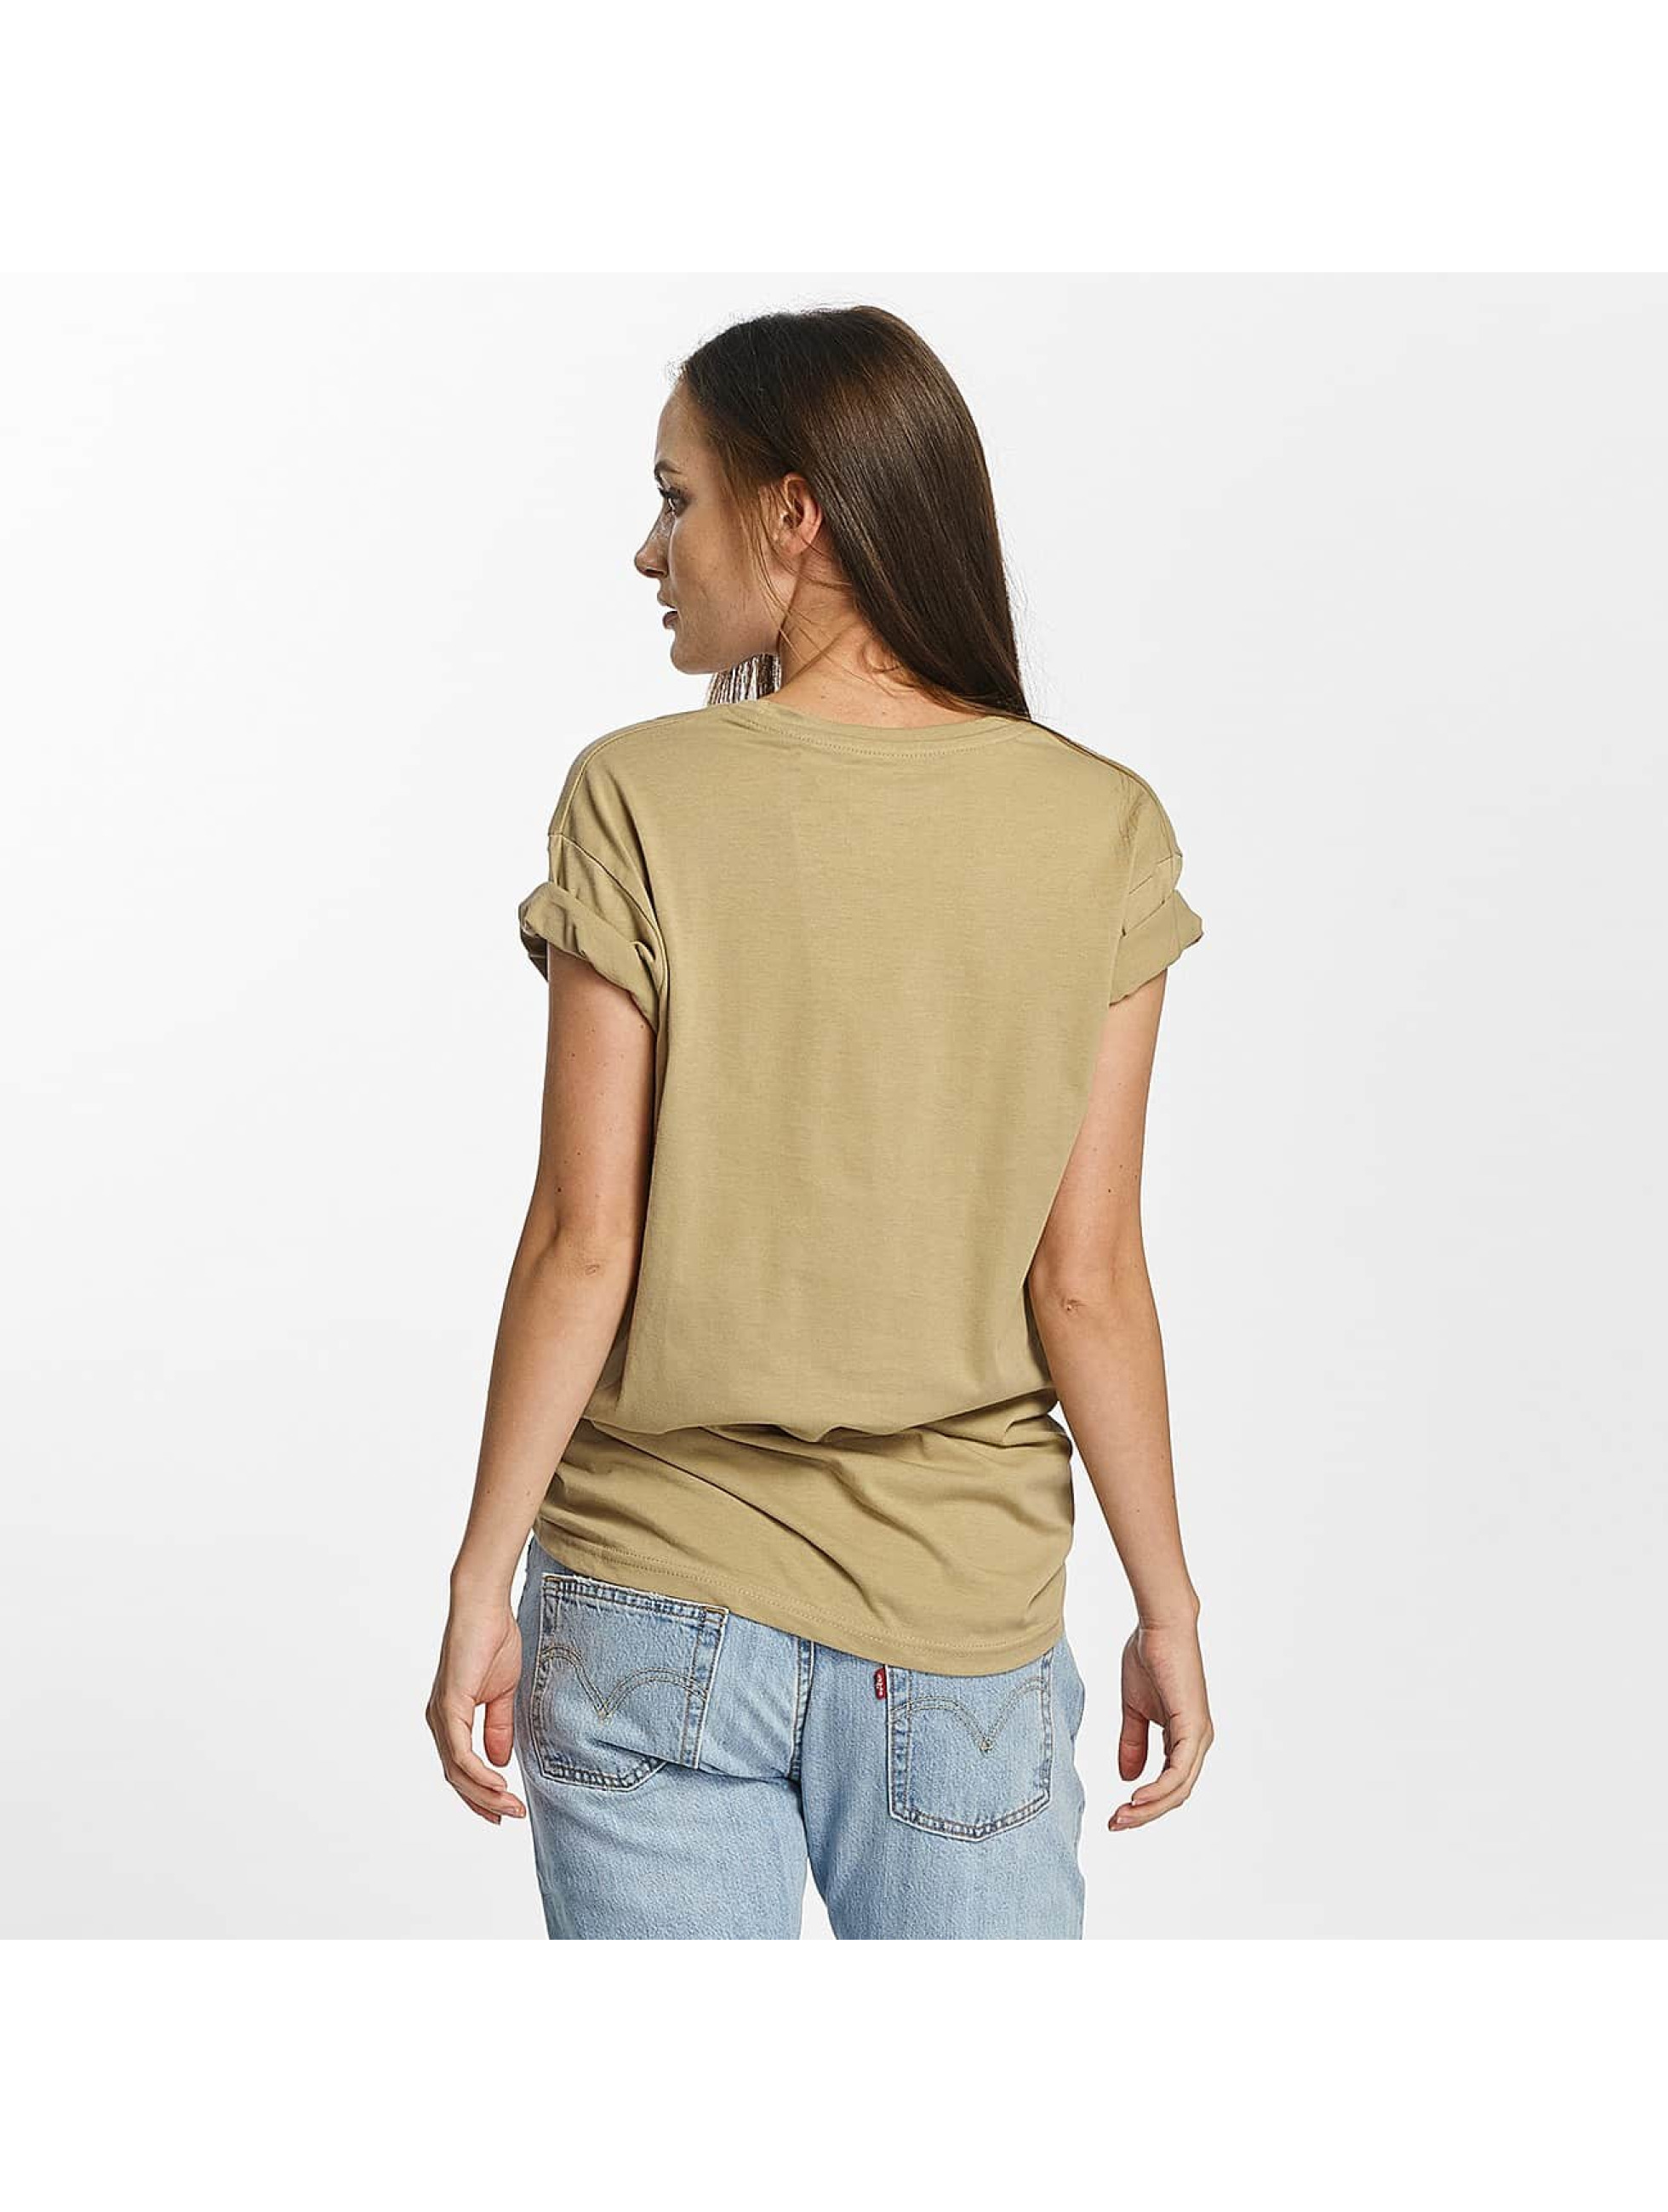 Cyprime T-shirts Cerium Oversized beige